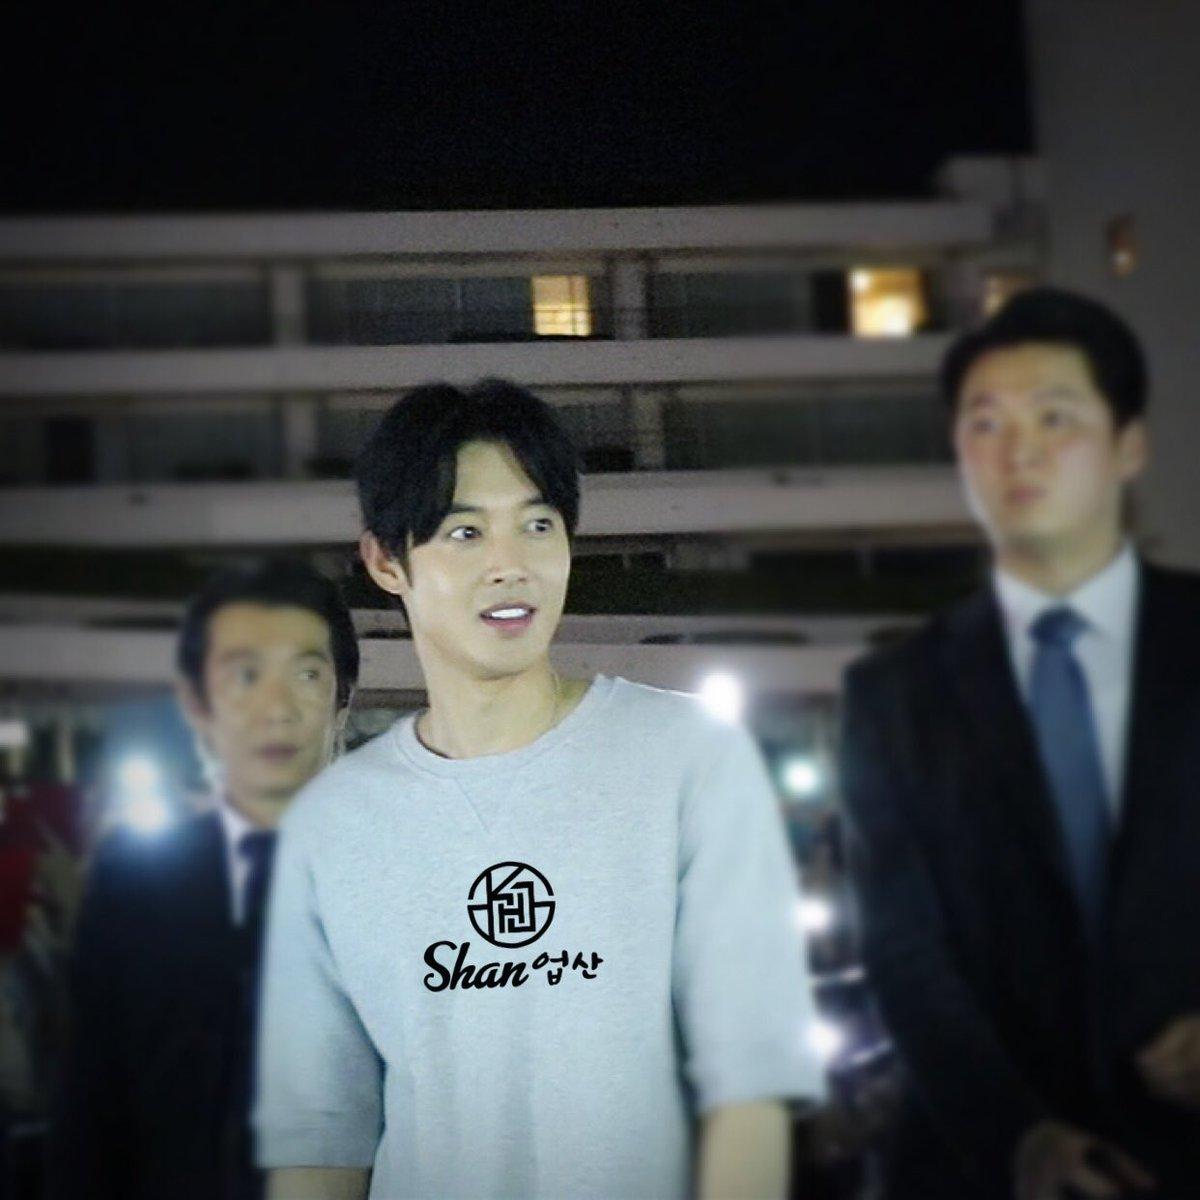 [Fanpics] KHJ Japan Tour 2017 Inner Core in Fukuoka Sun Palace Concert Hall [2017.07.03]